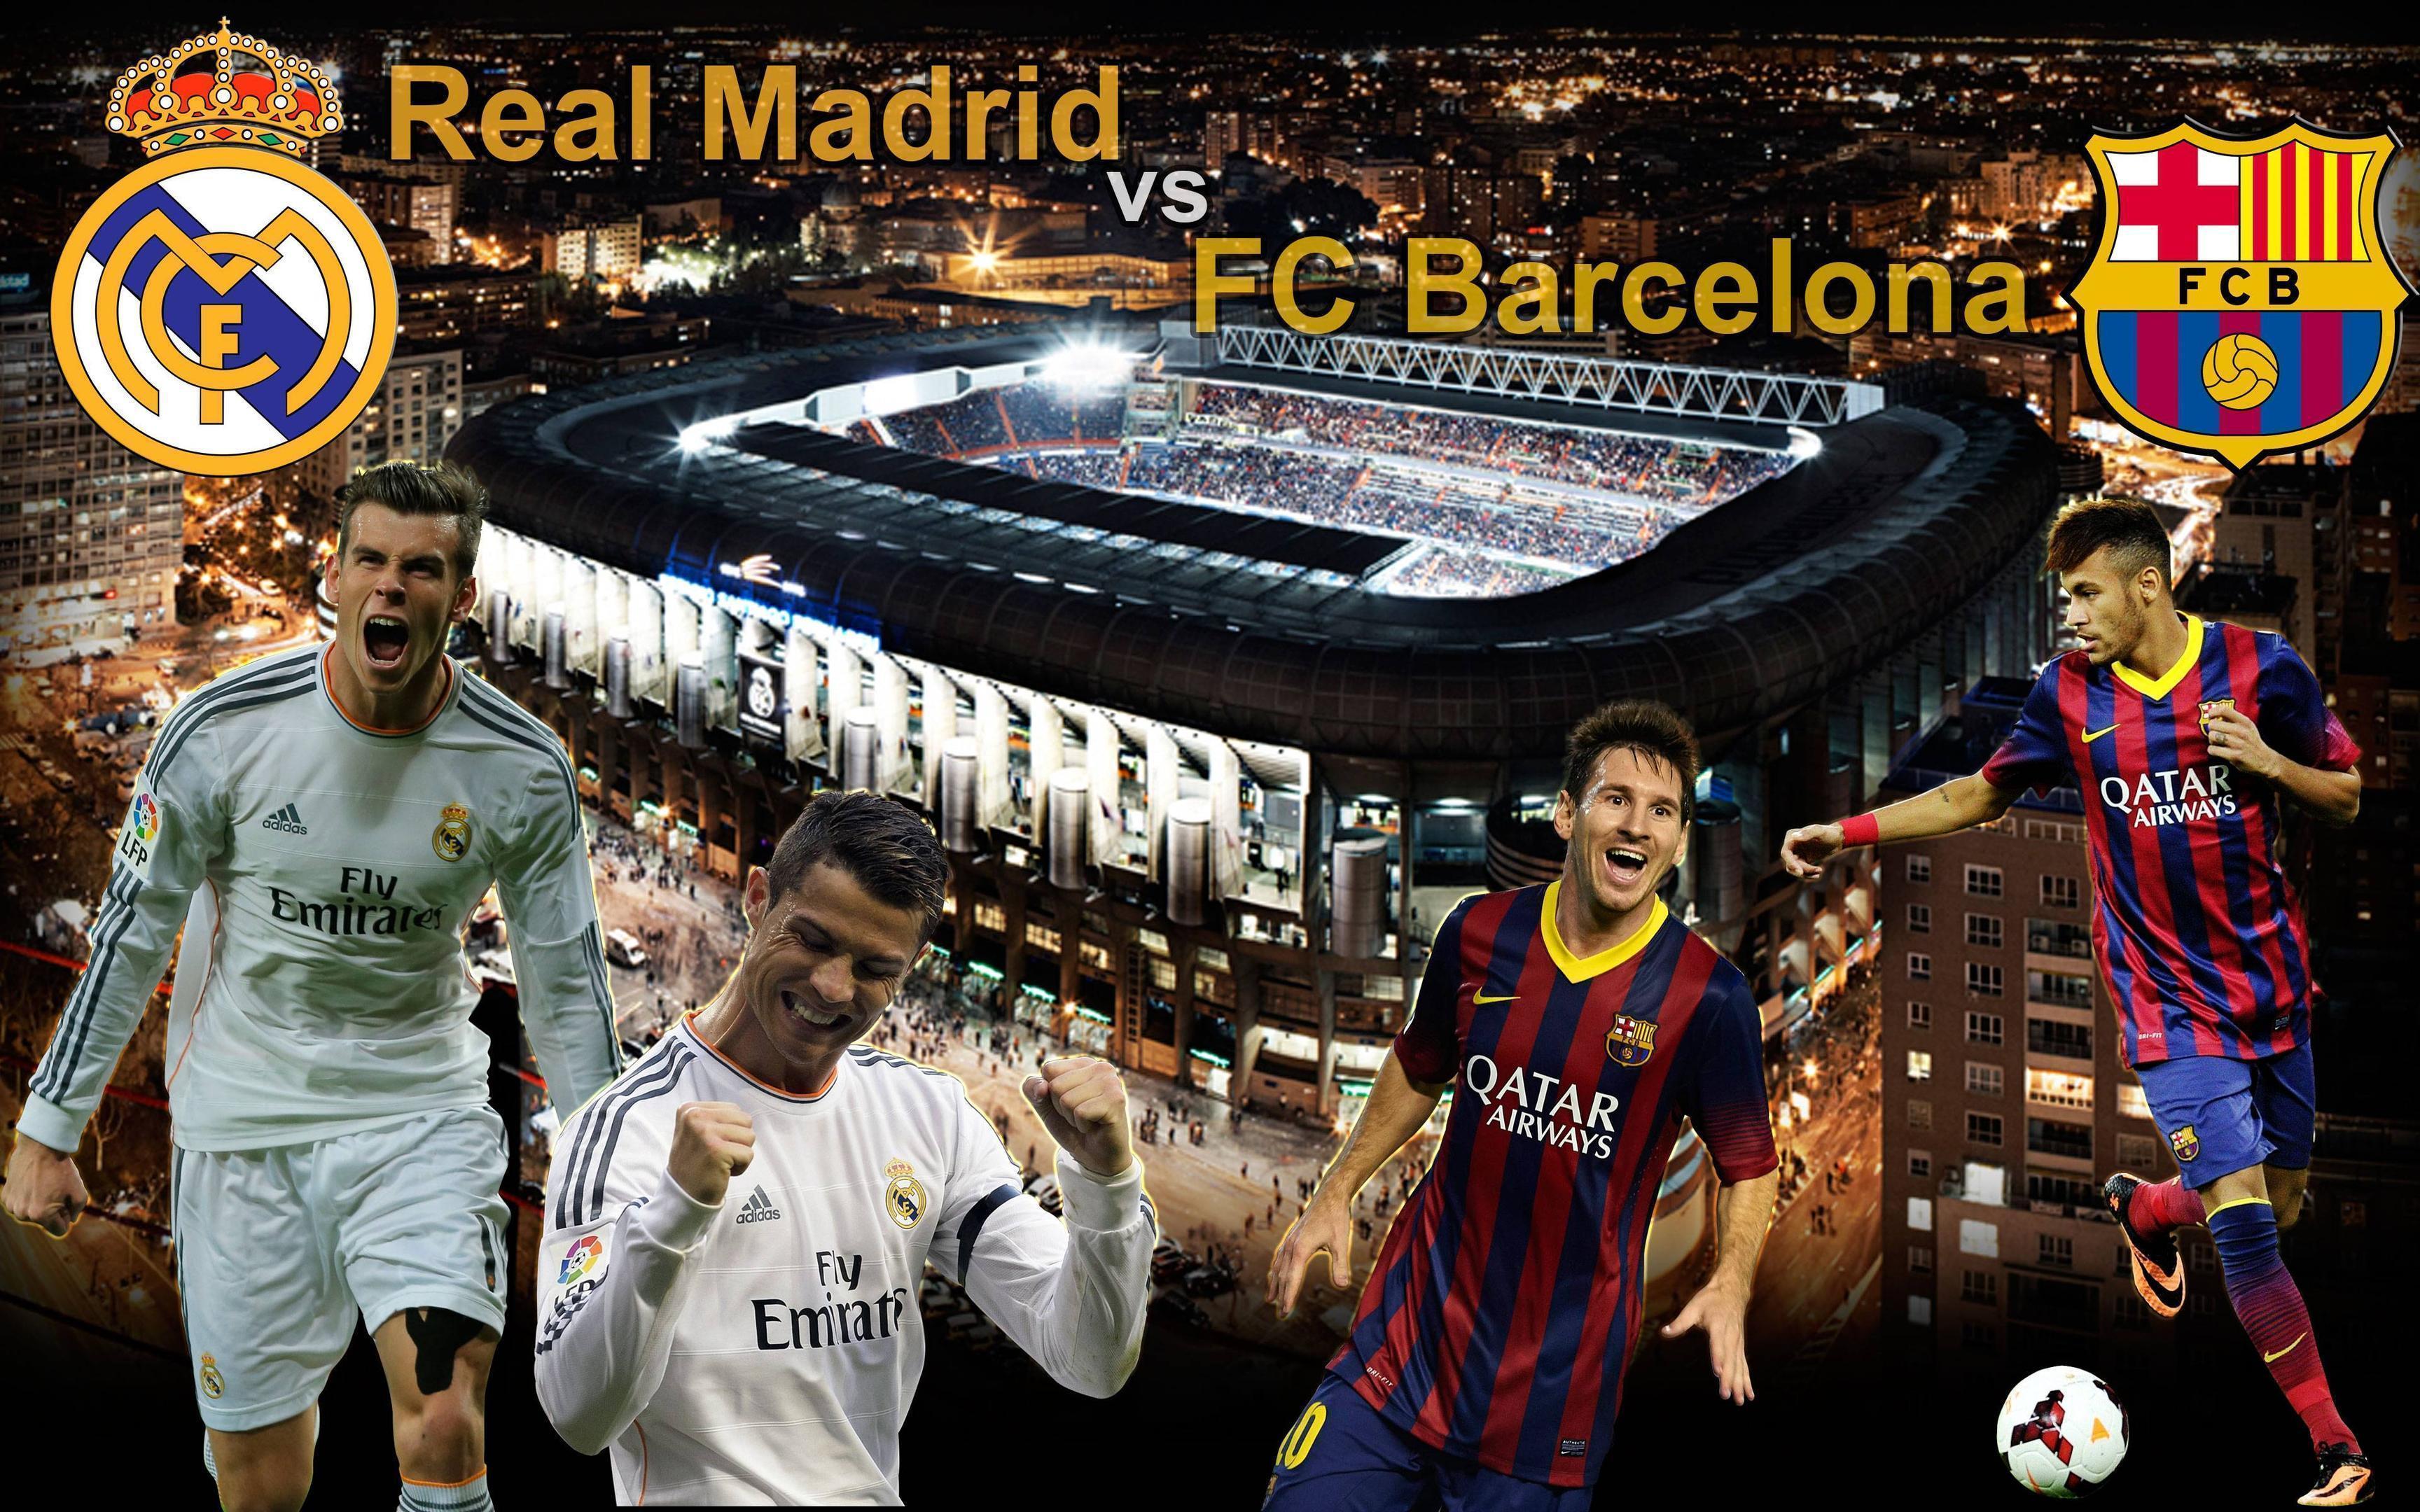 Real Madrid D Messi Vs Ronaldo Wallpapers 2015 Hd Wallpaper Cave